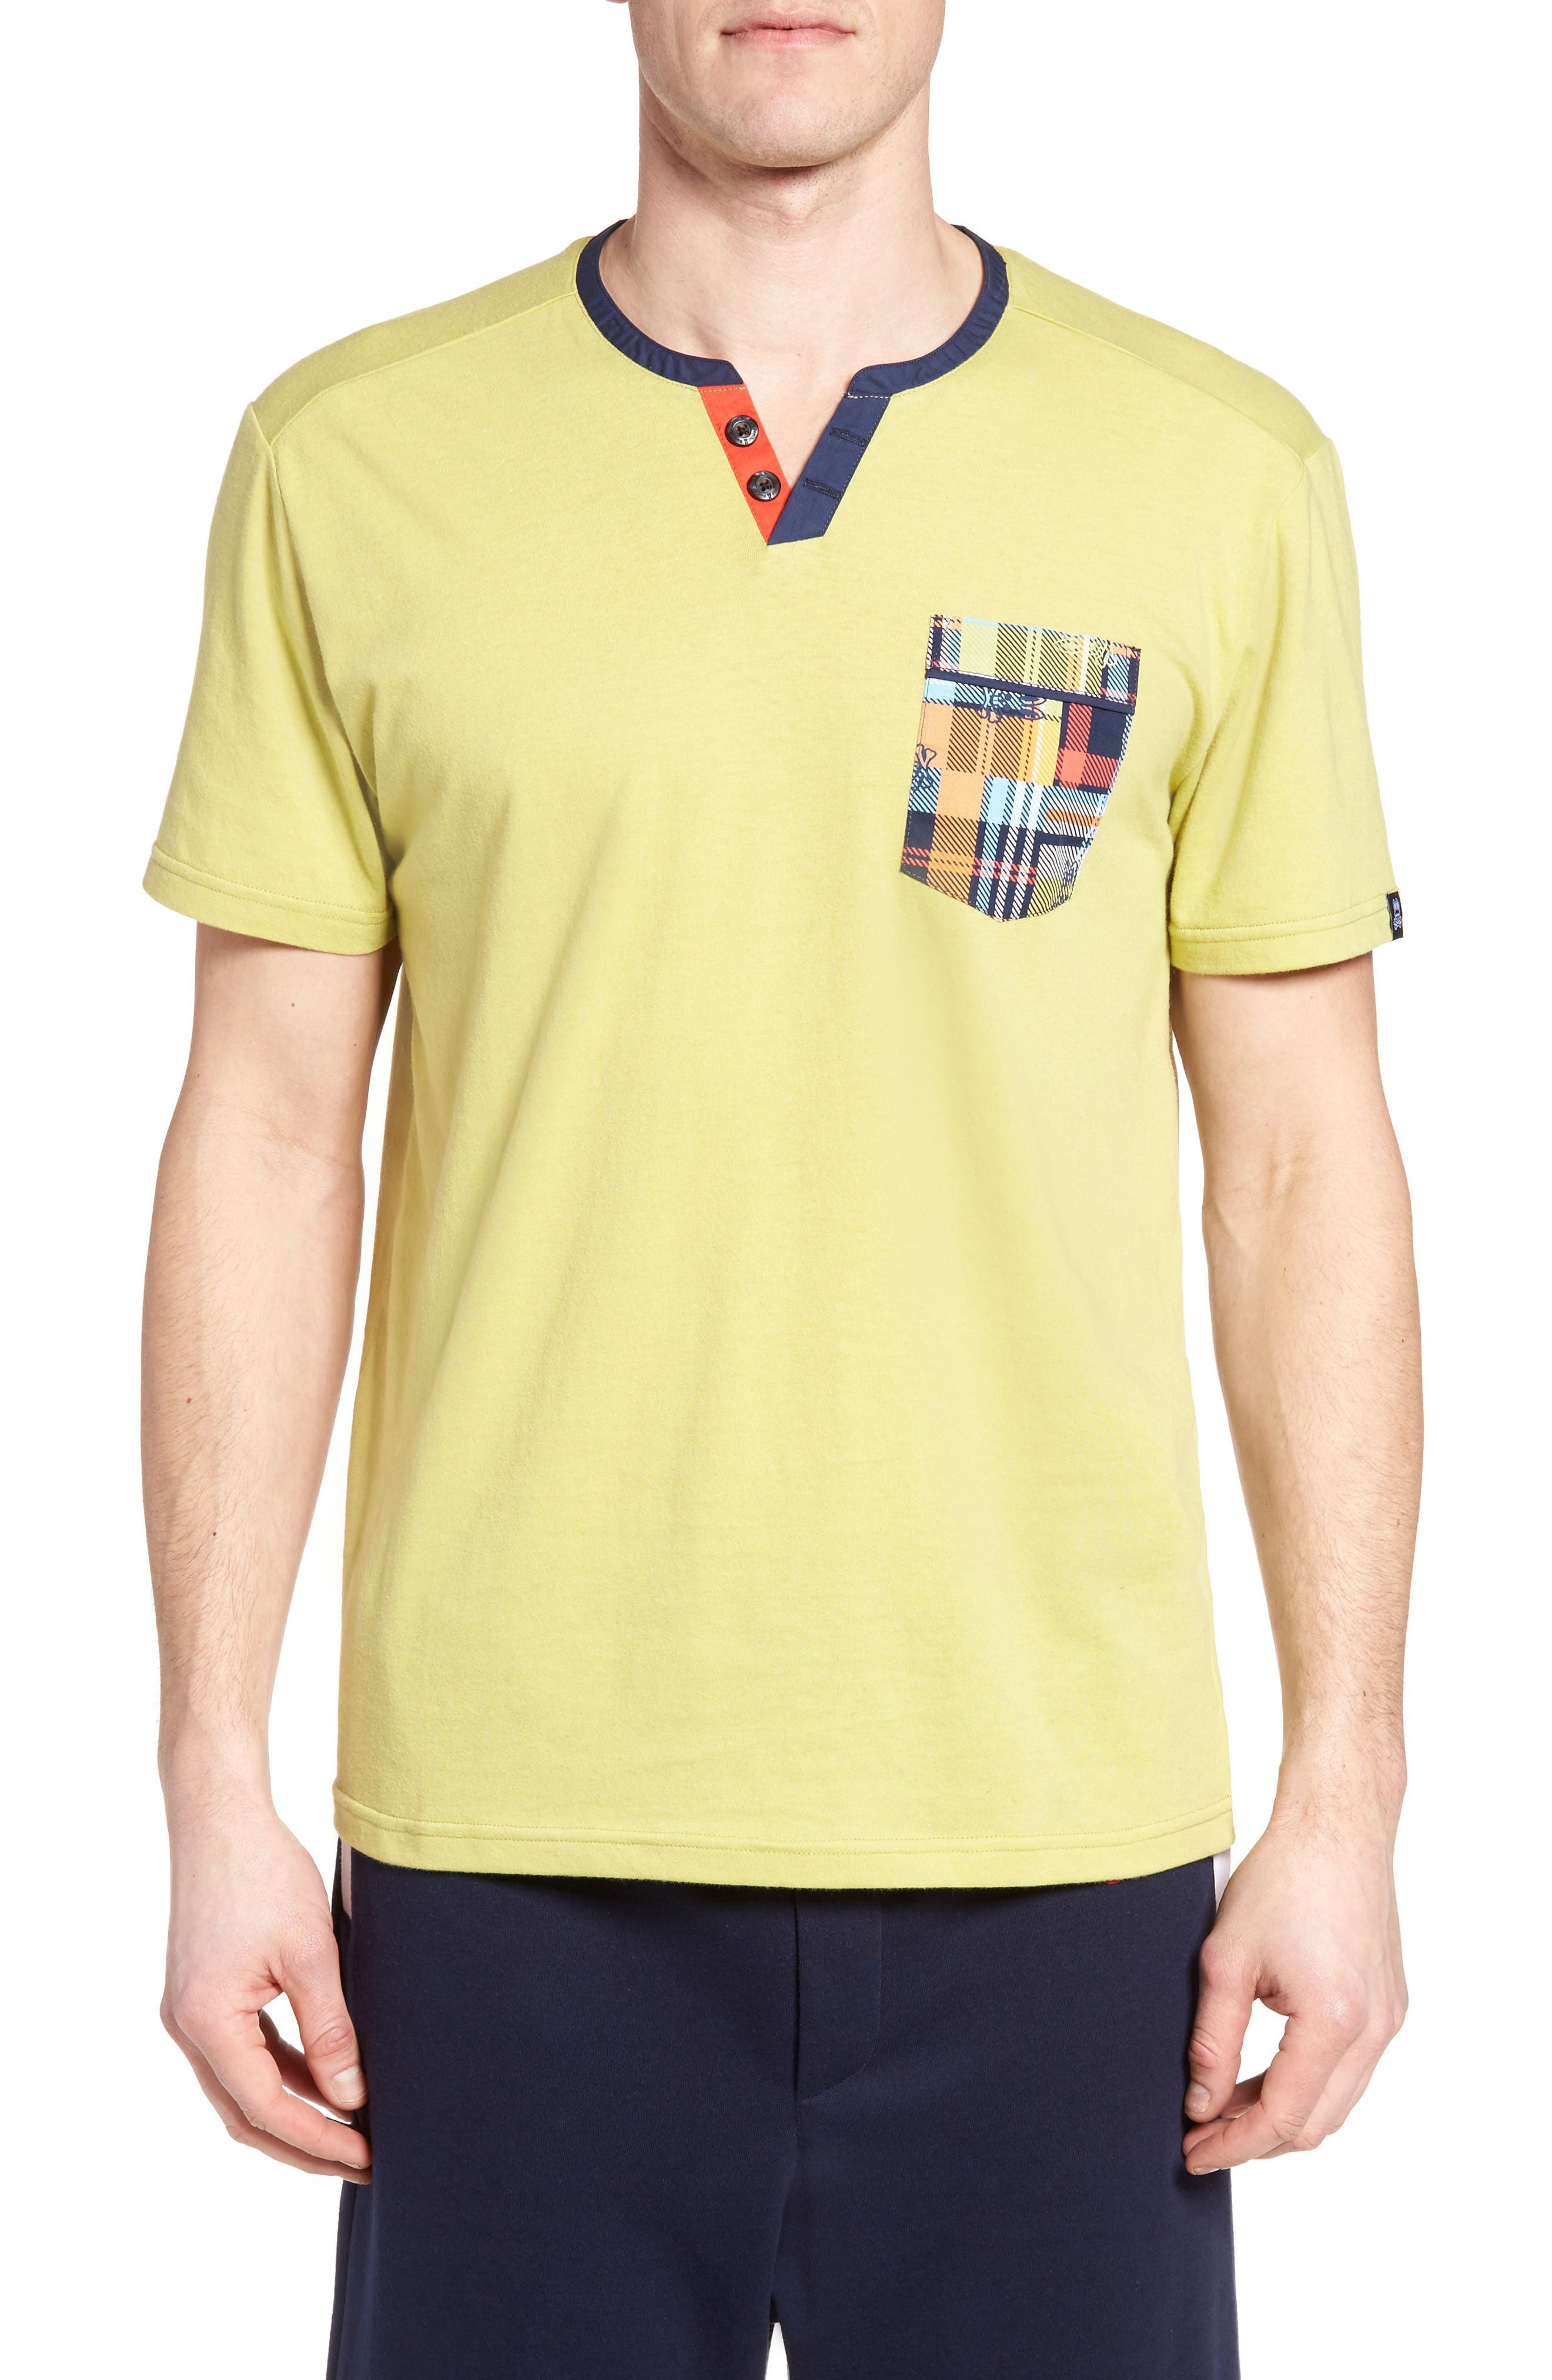 PSYCHO BUNNY Pocket Henley Lounge T-Shirt